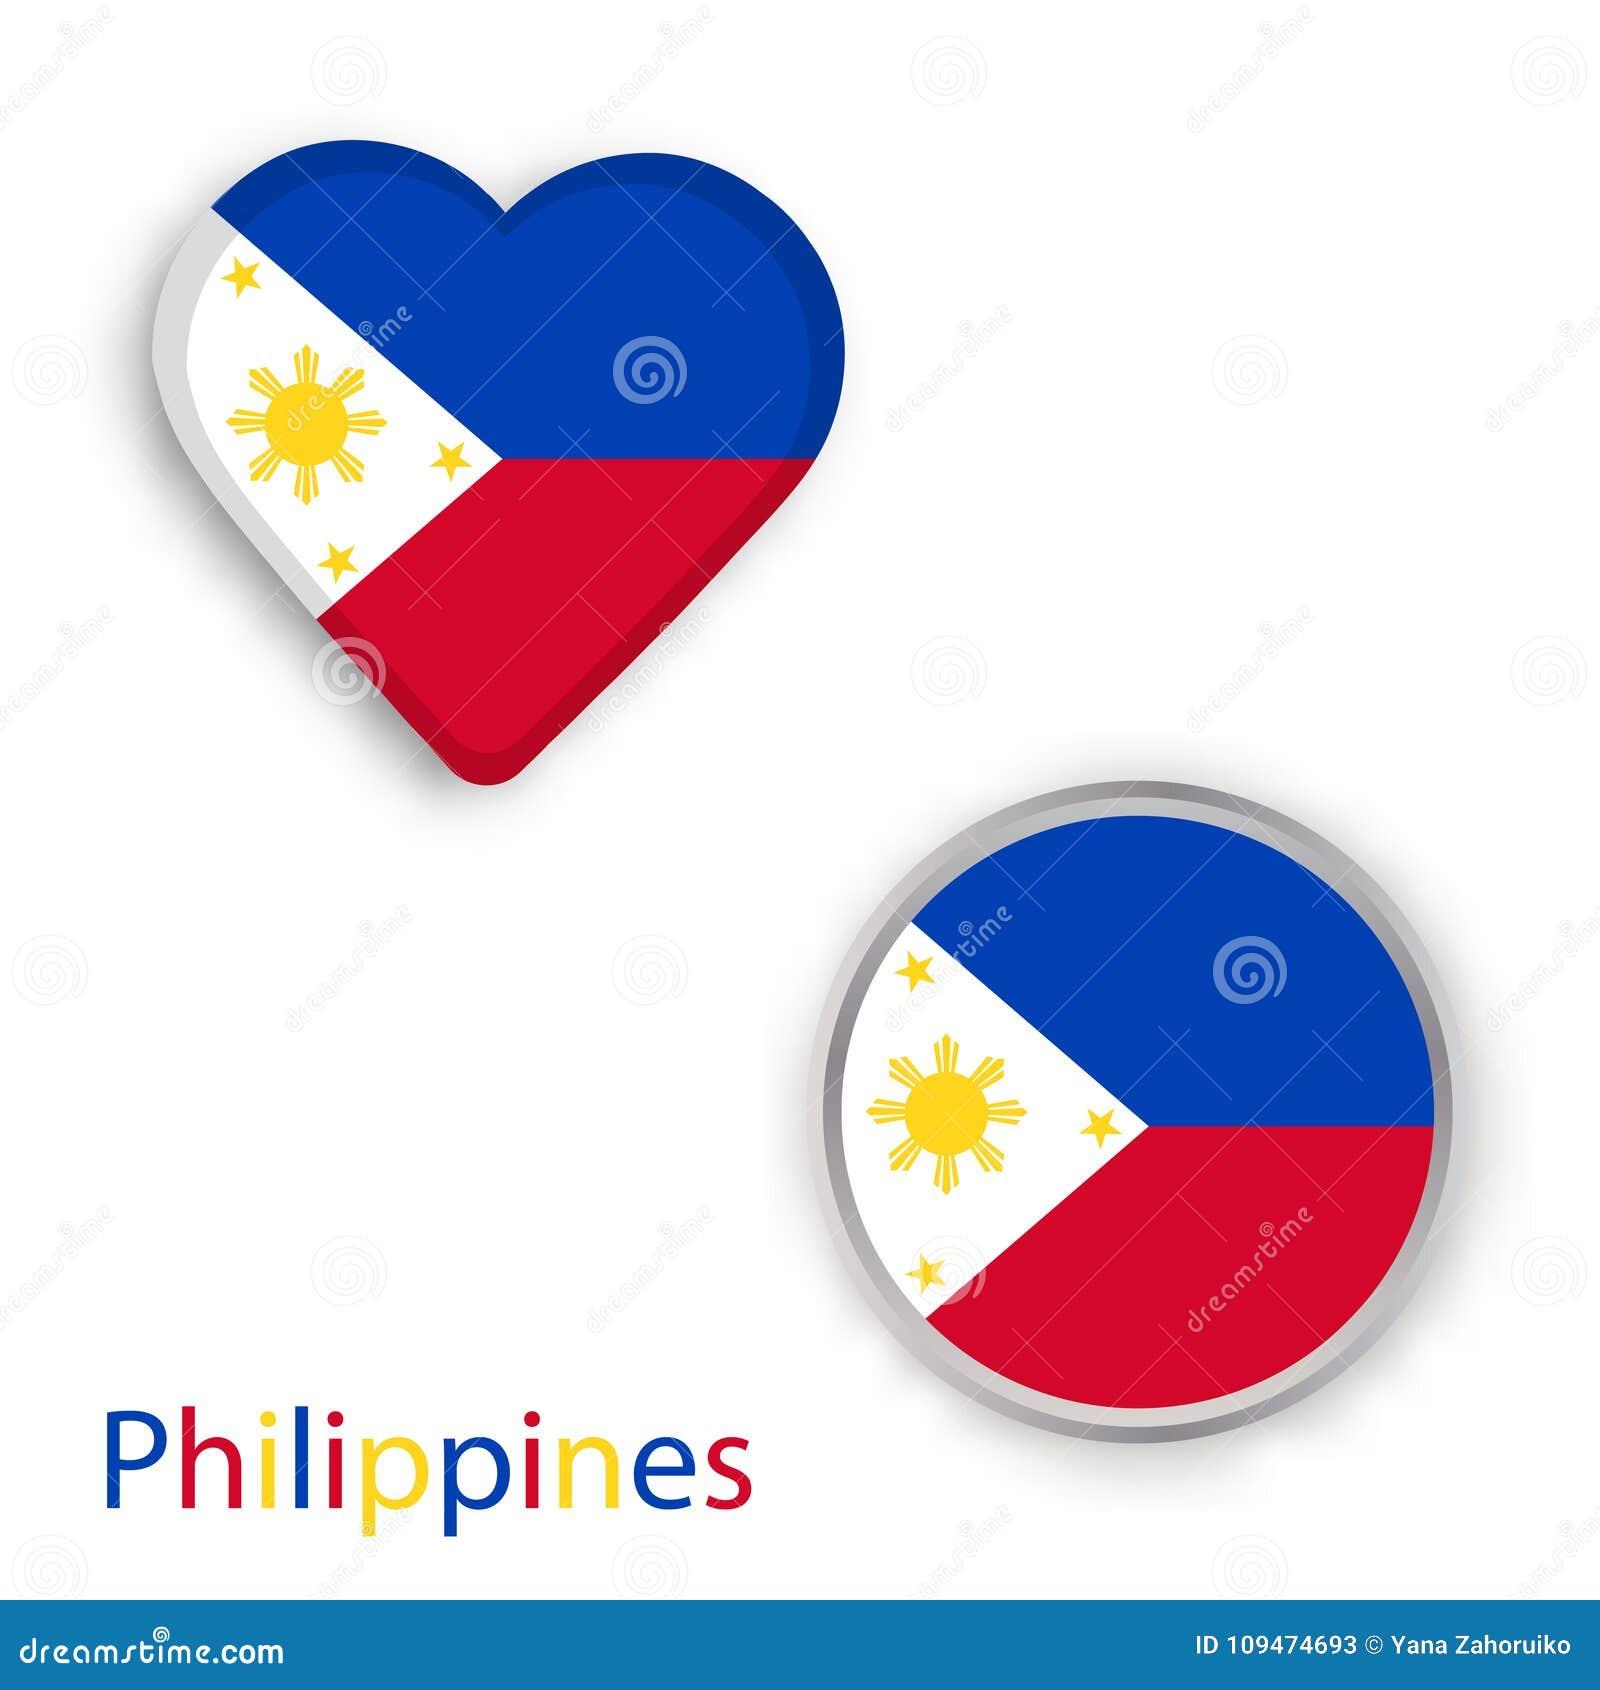 Heart and circle symbols with flag of philippines stock heart and circle symbols with flag of philippines buycottarizona Images